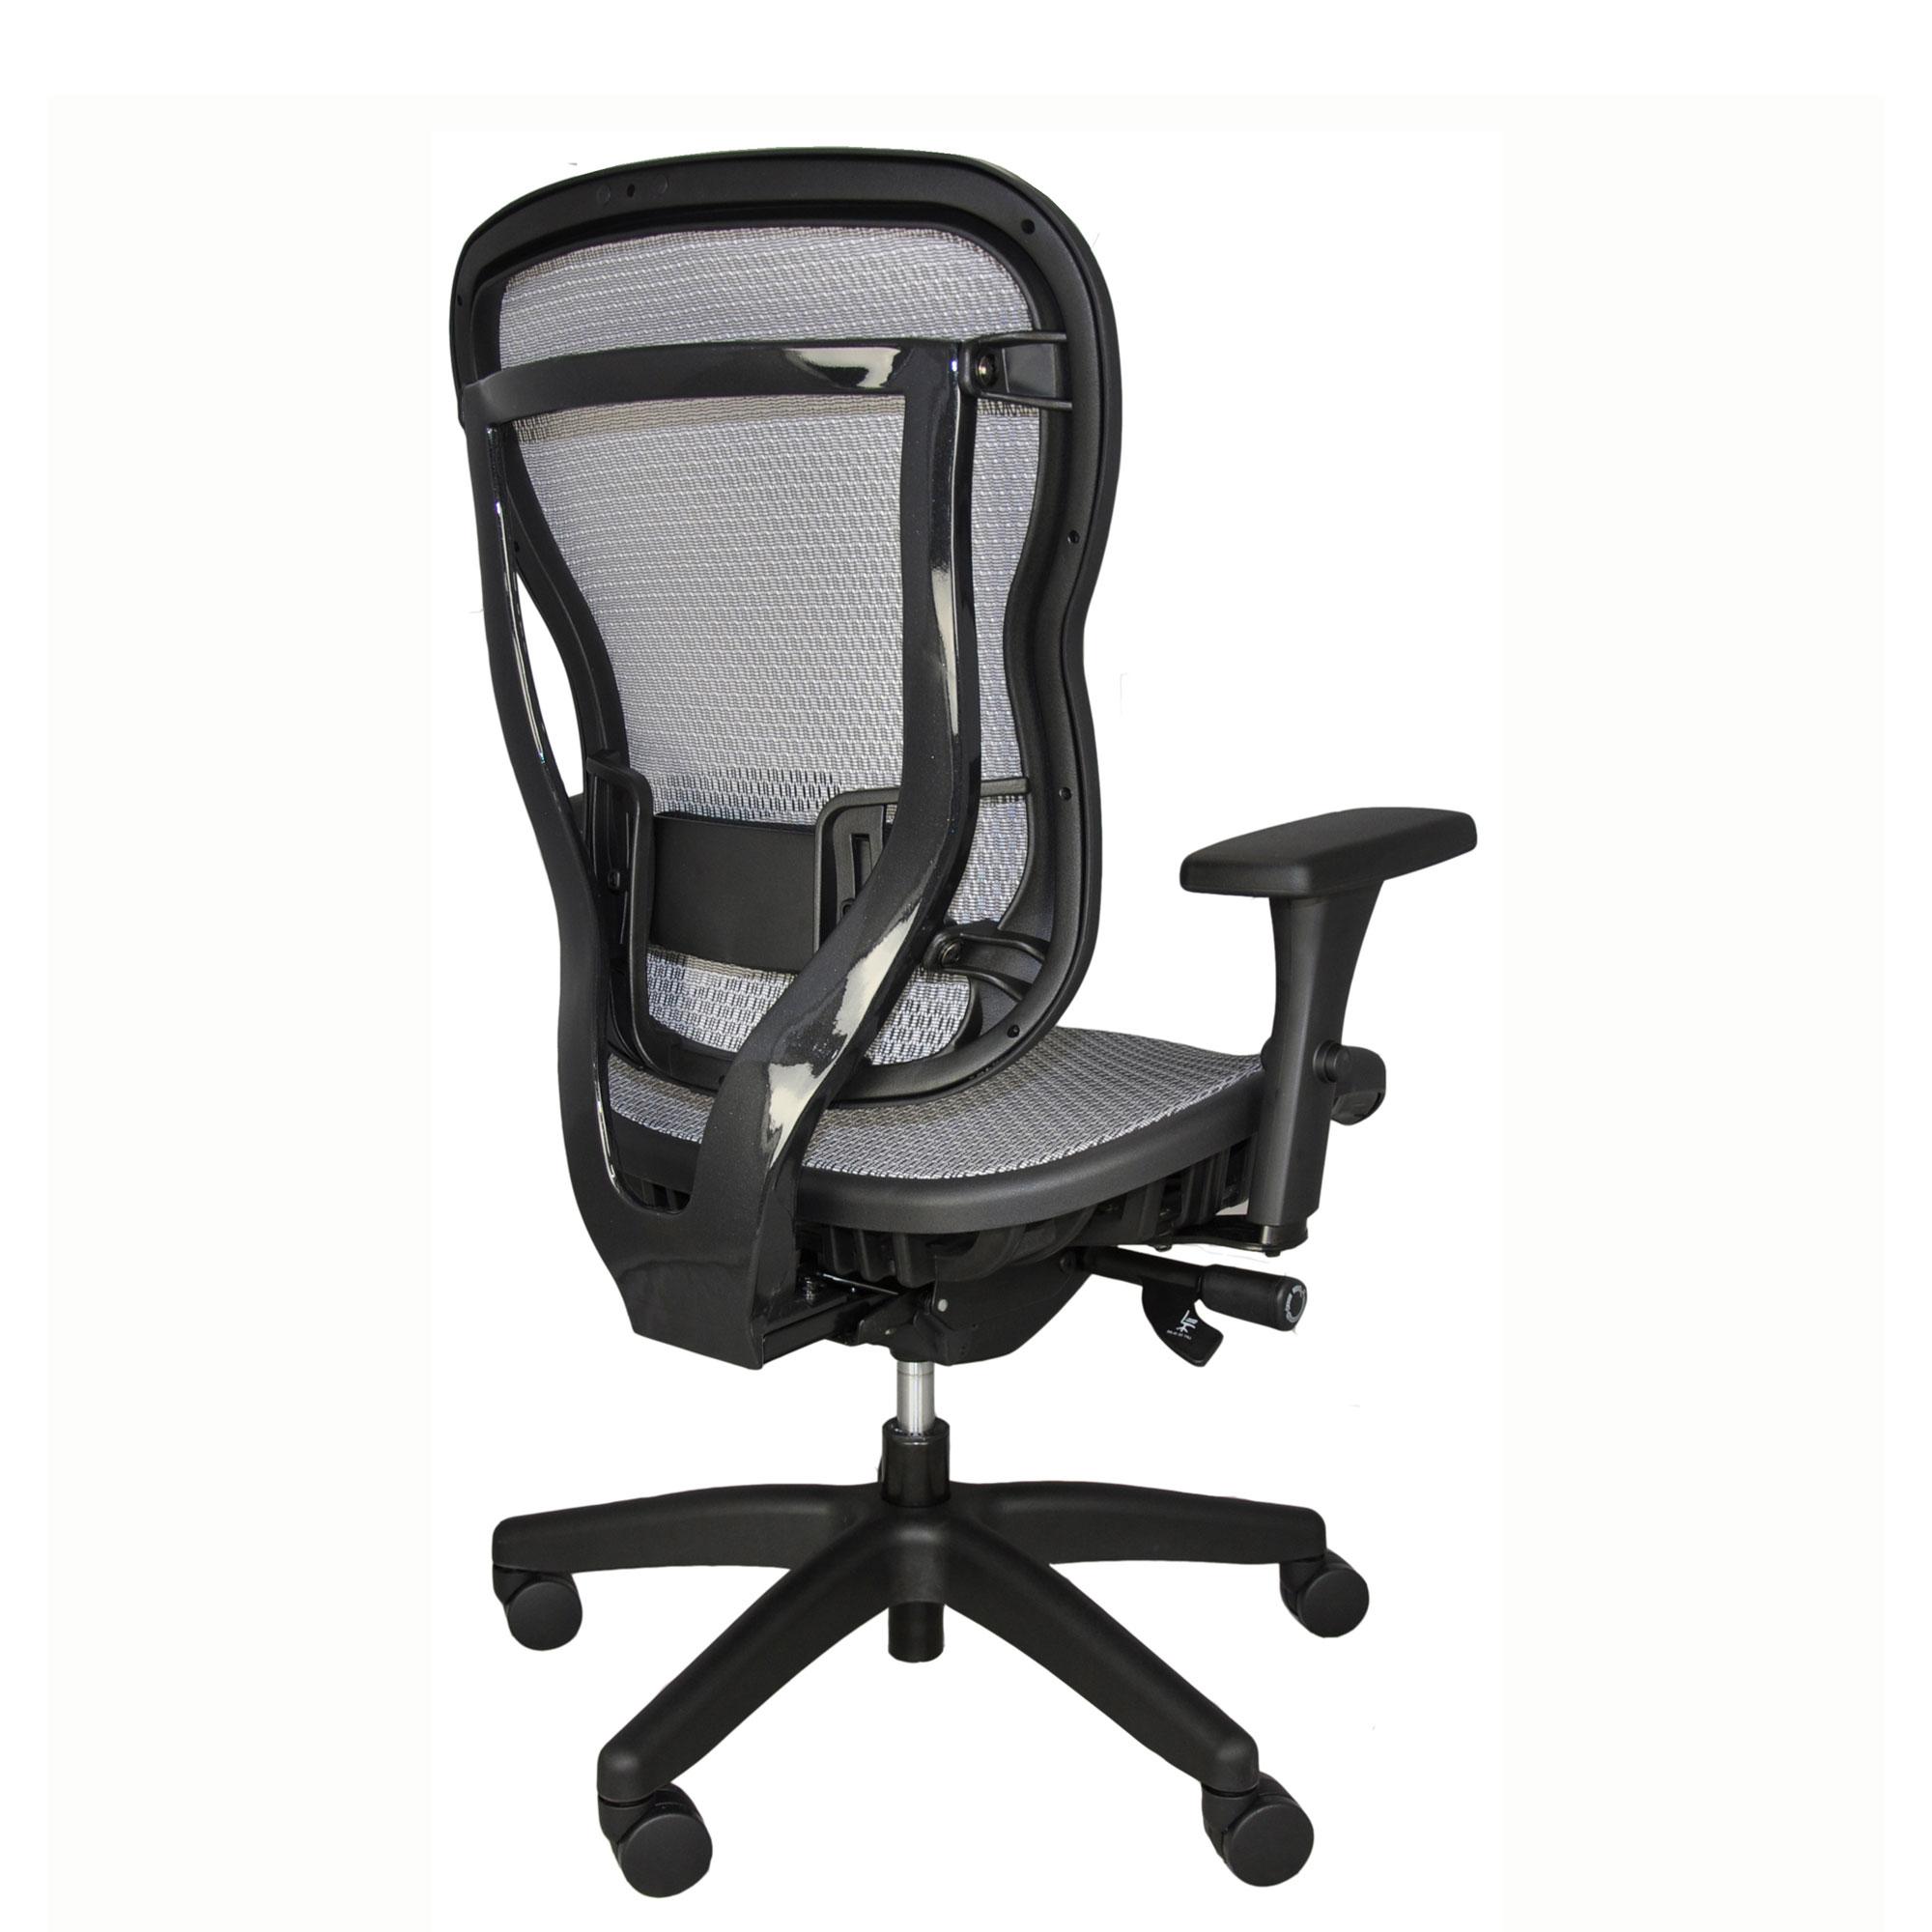 Ergonomic all-mesh office chair - light gray - silver - back angle